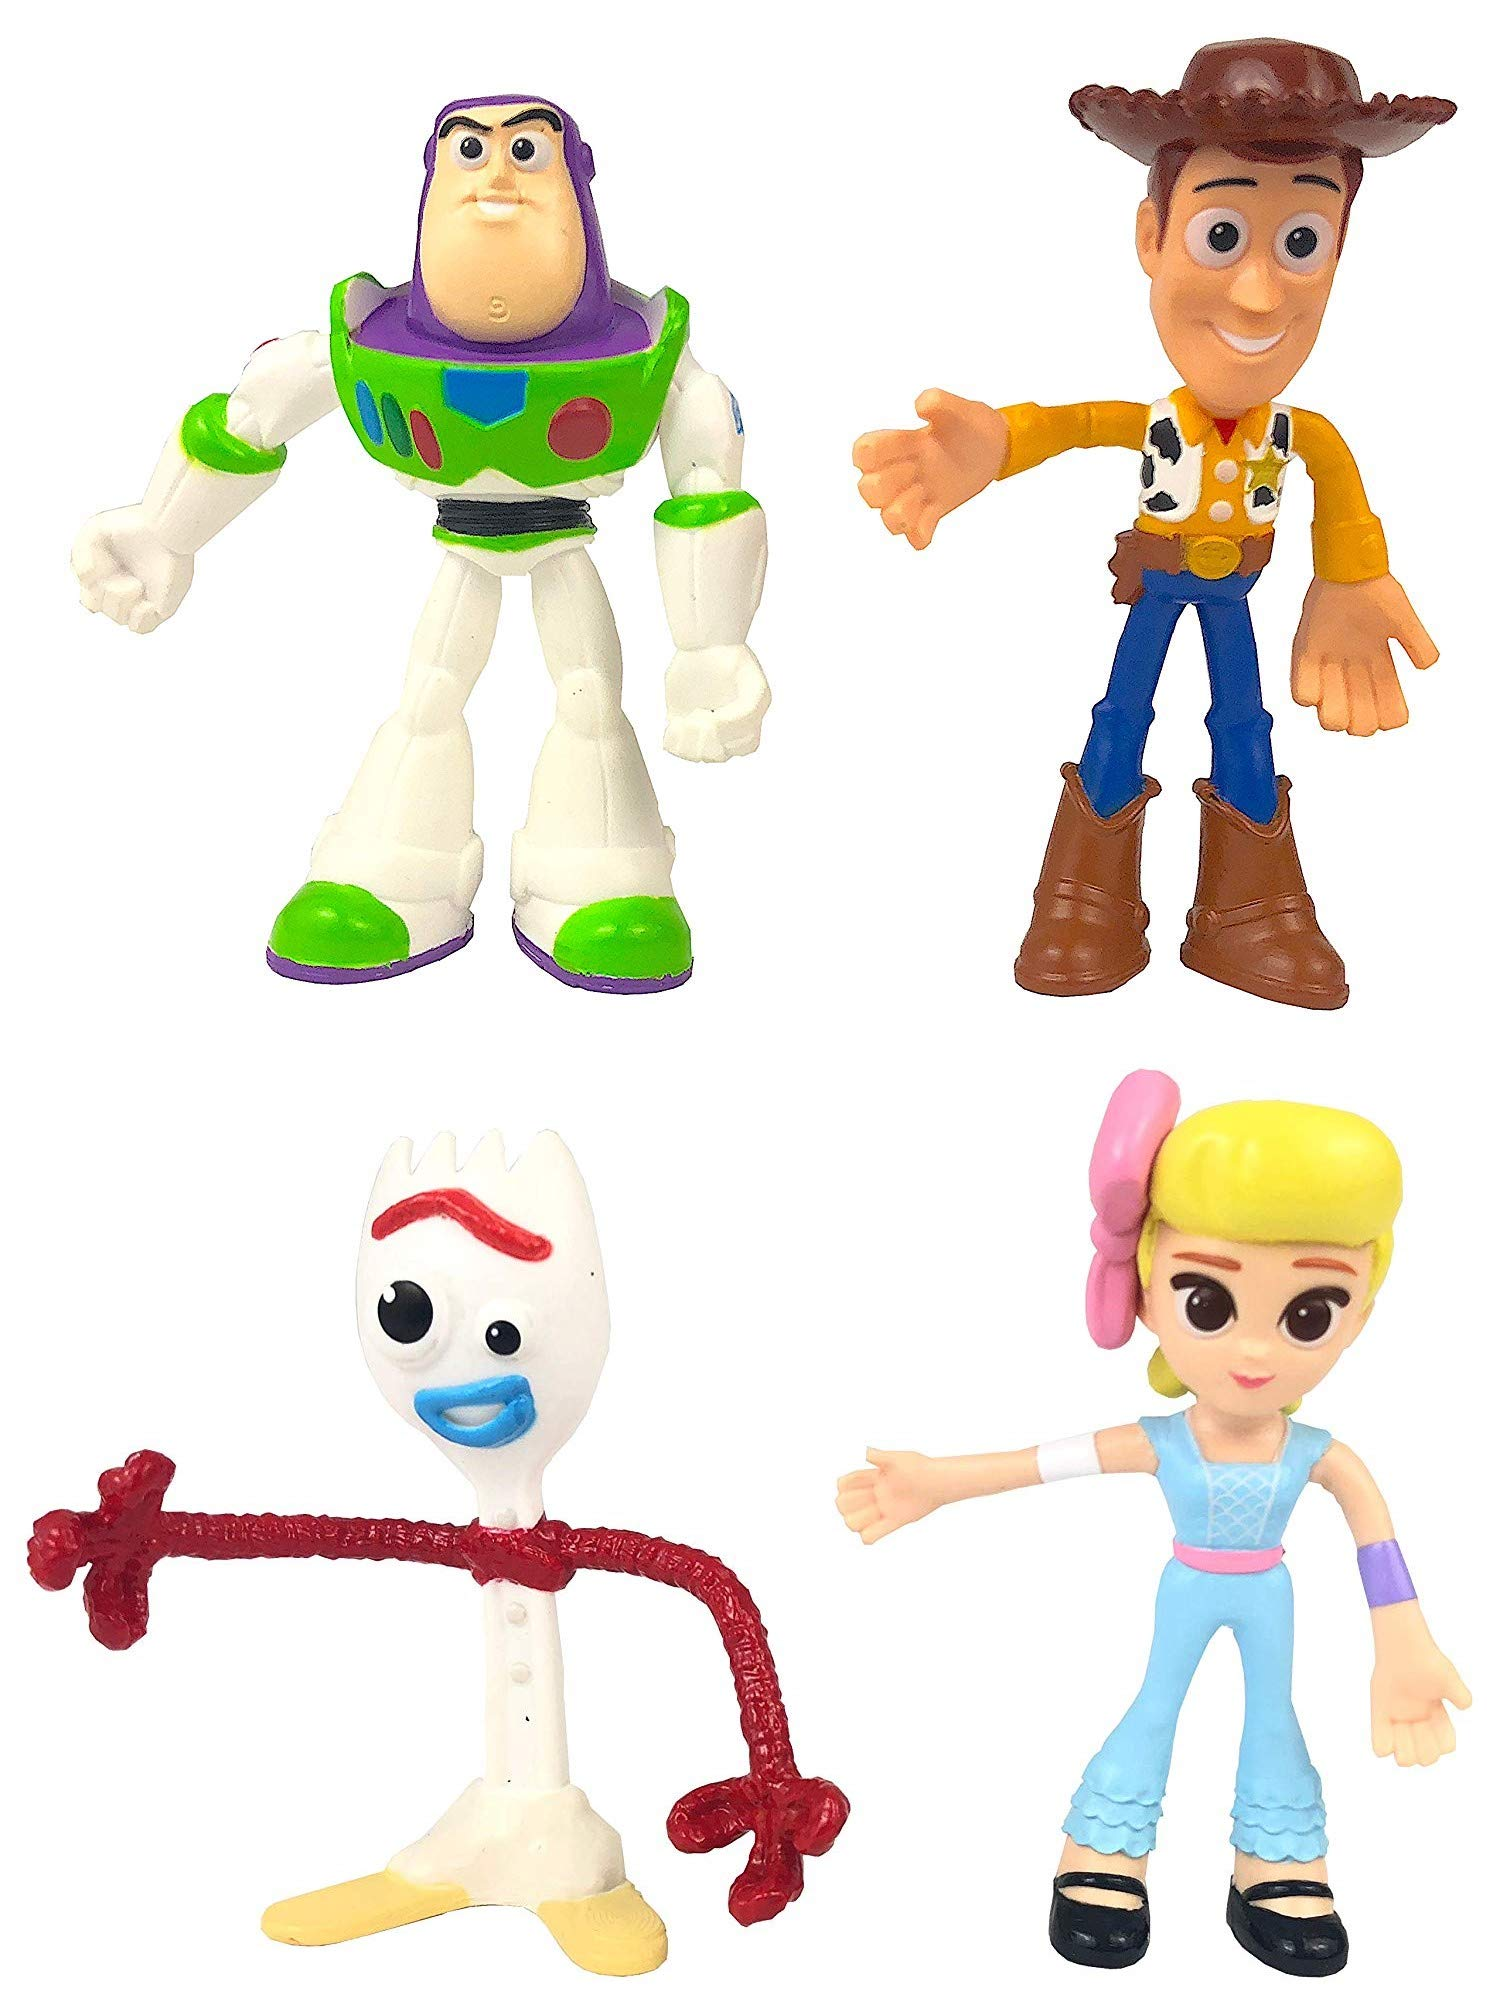 Dinsey Toy Story 4 Flextreme Bendable Figure Set Woody Buzz Forky Bo Peep